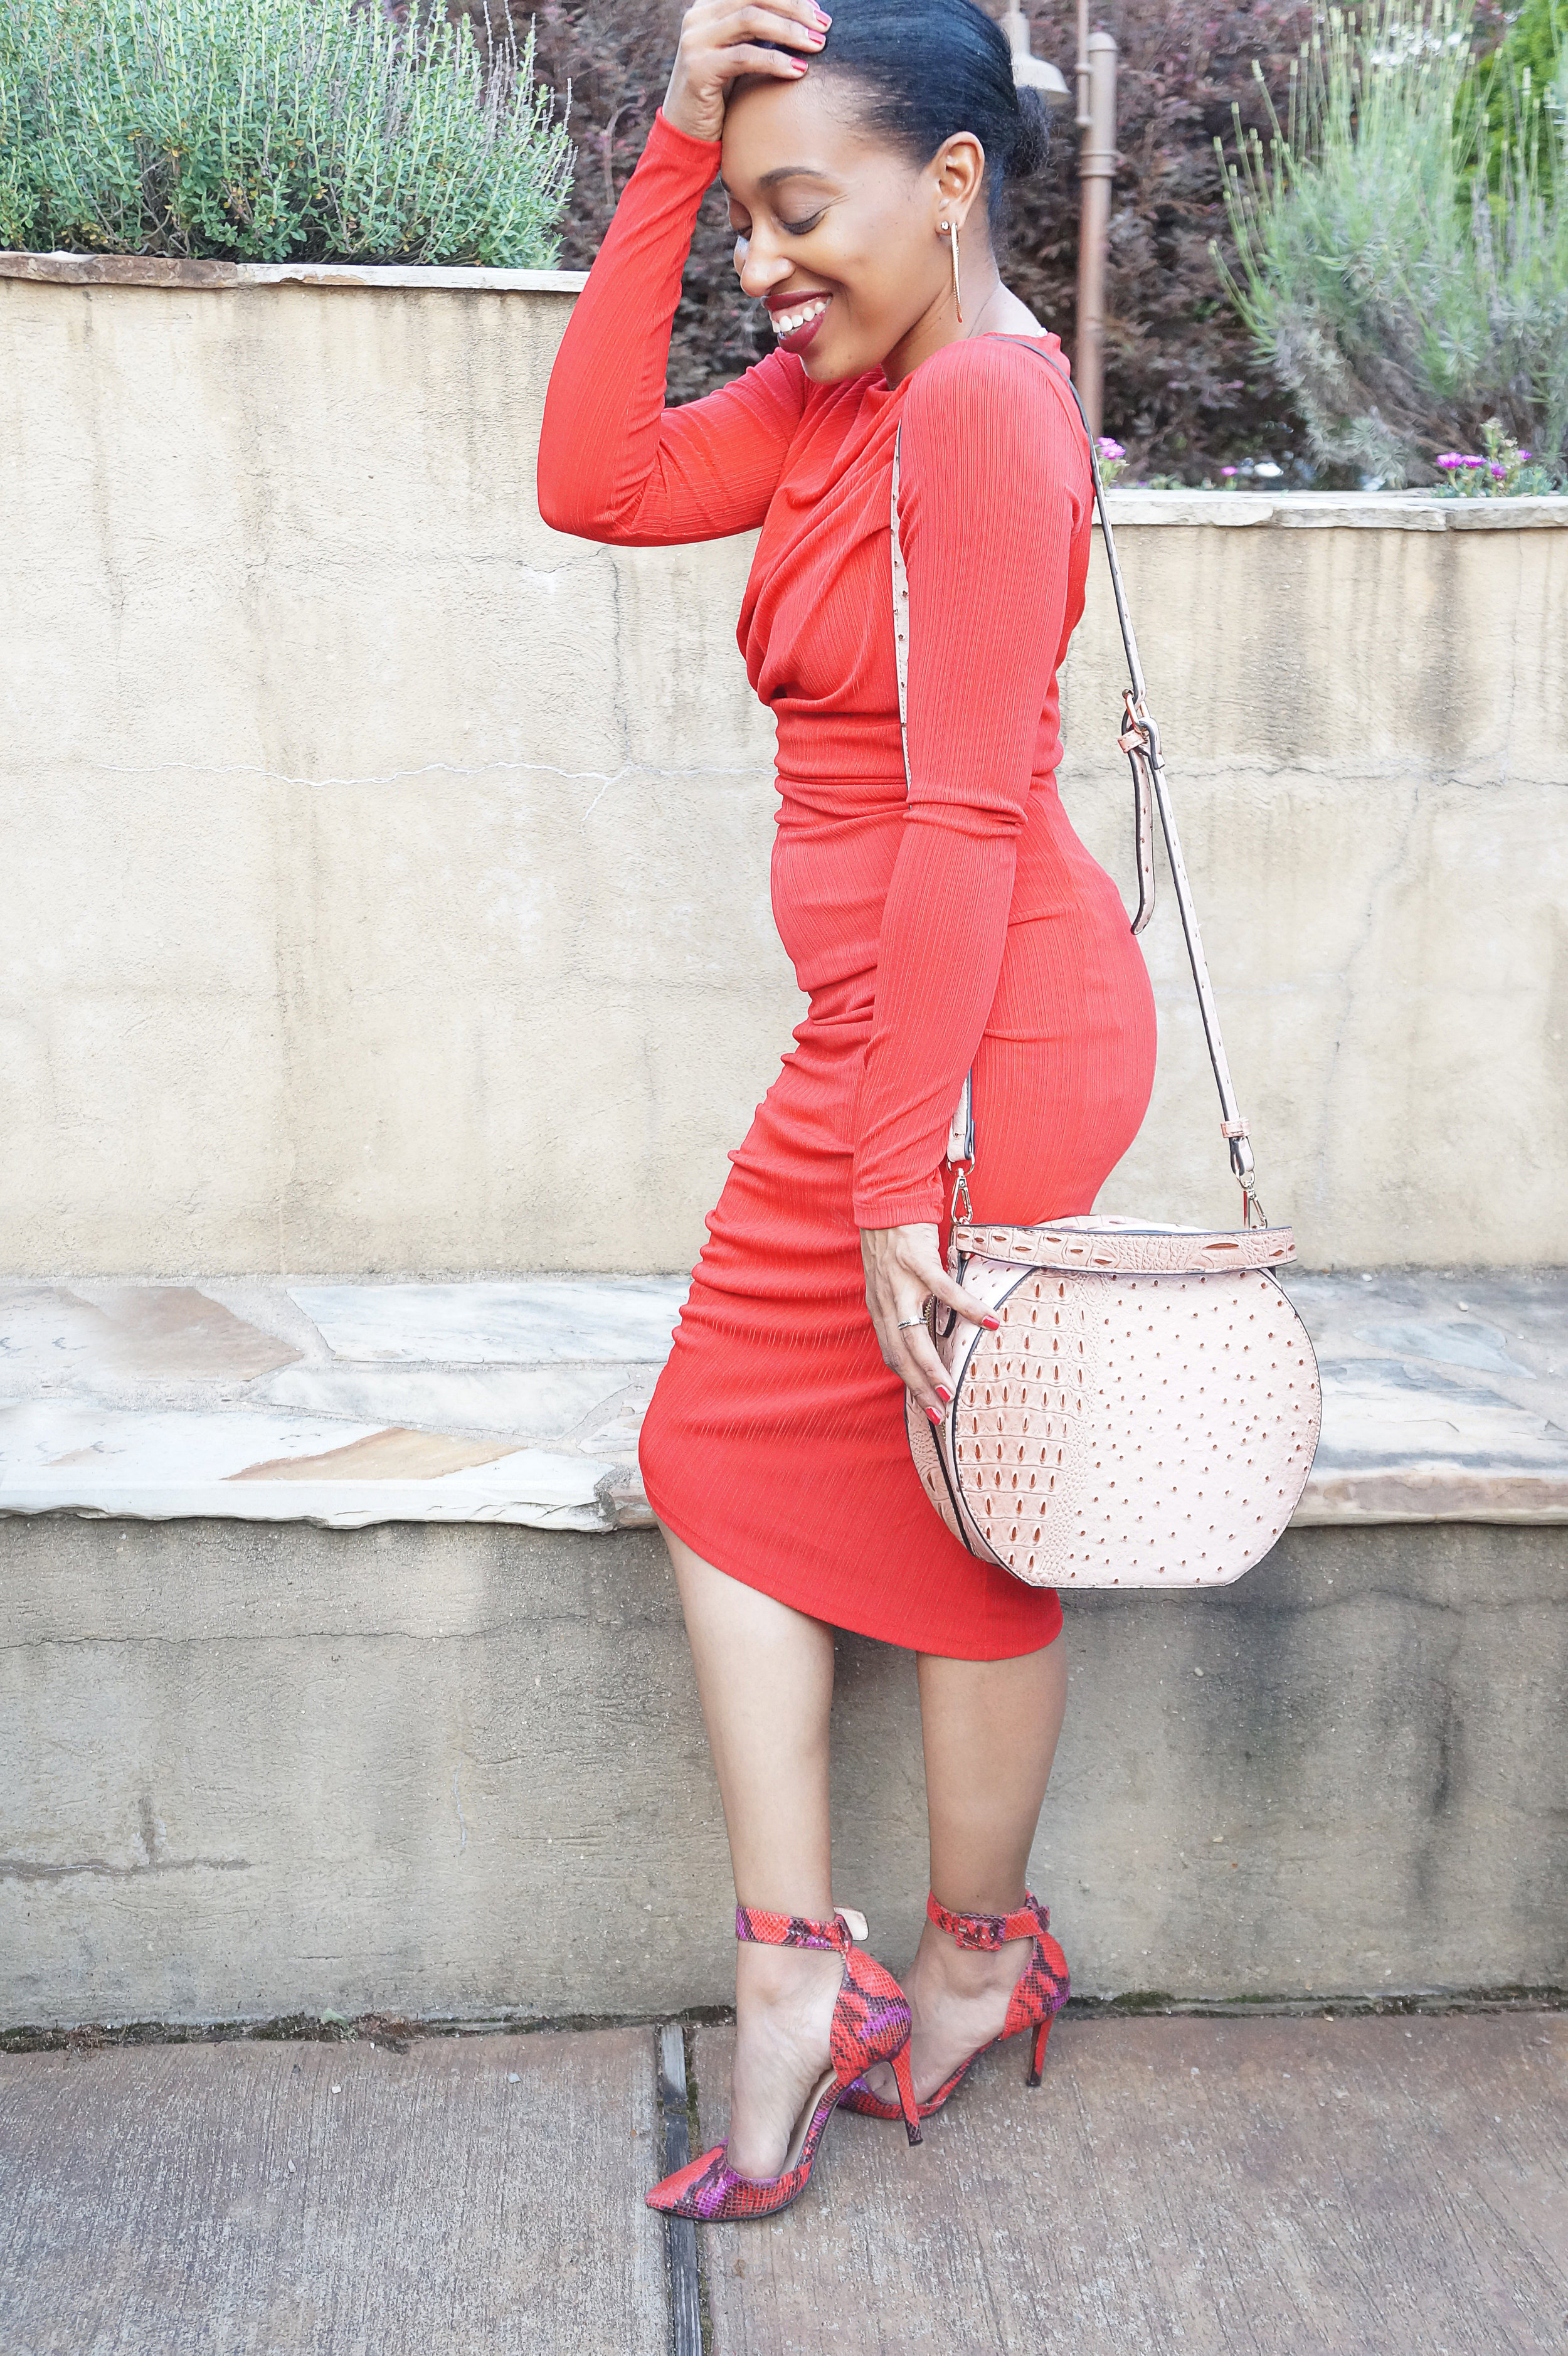 Andrea Fenise Memphis Fashion Blogger shares outfit H&M dress